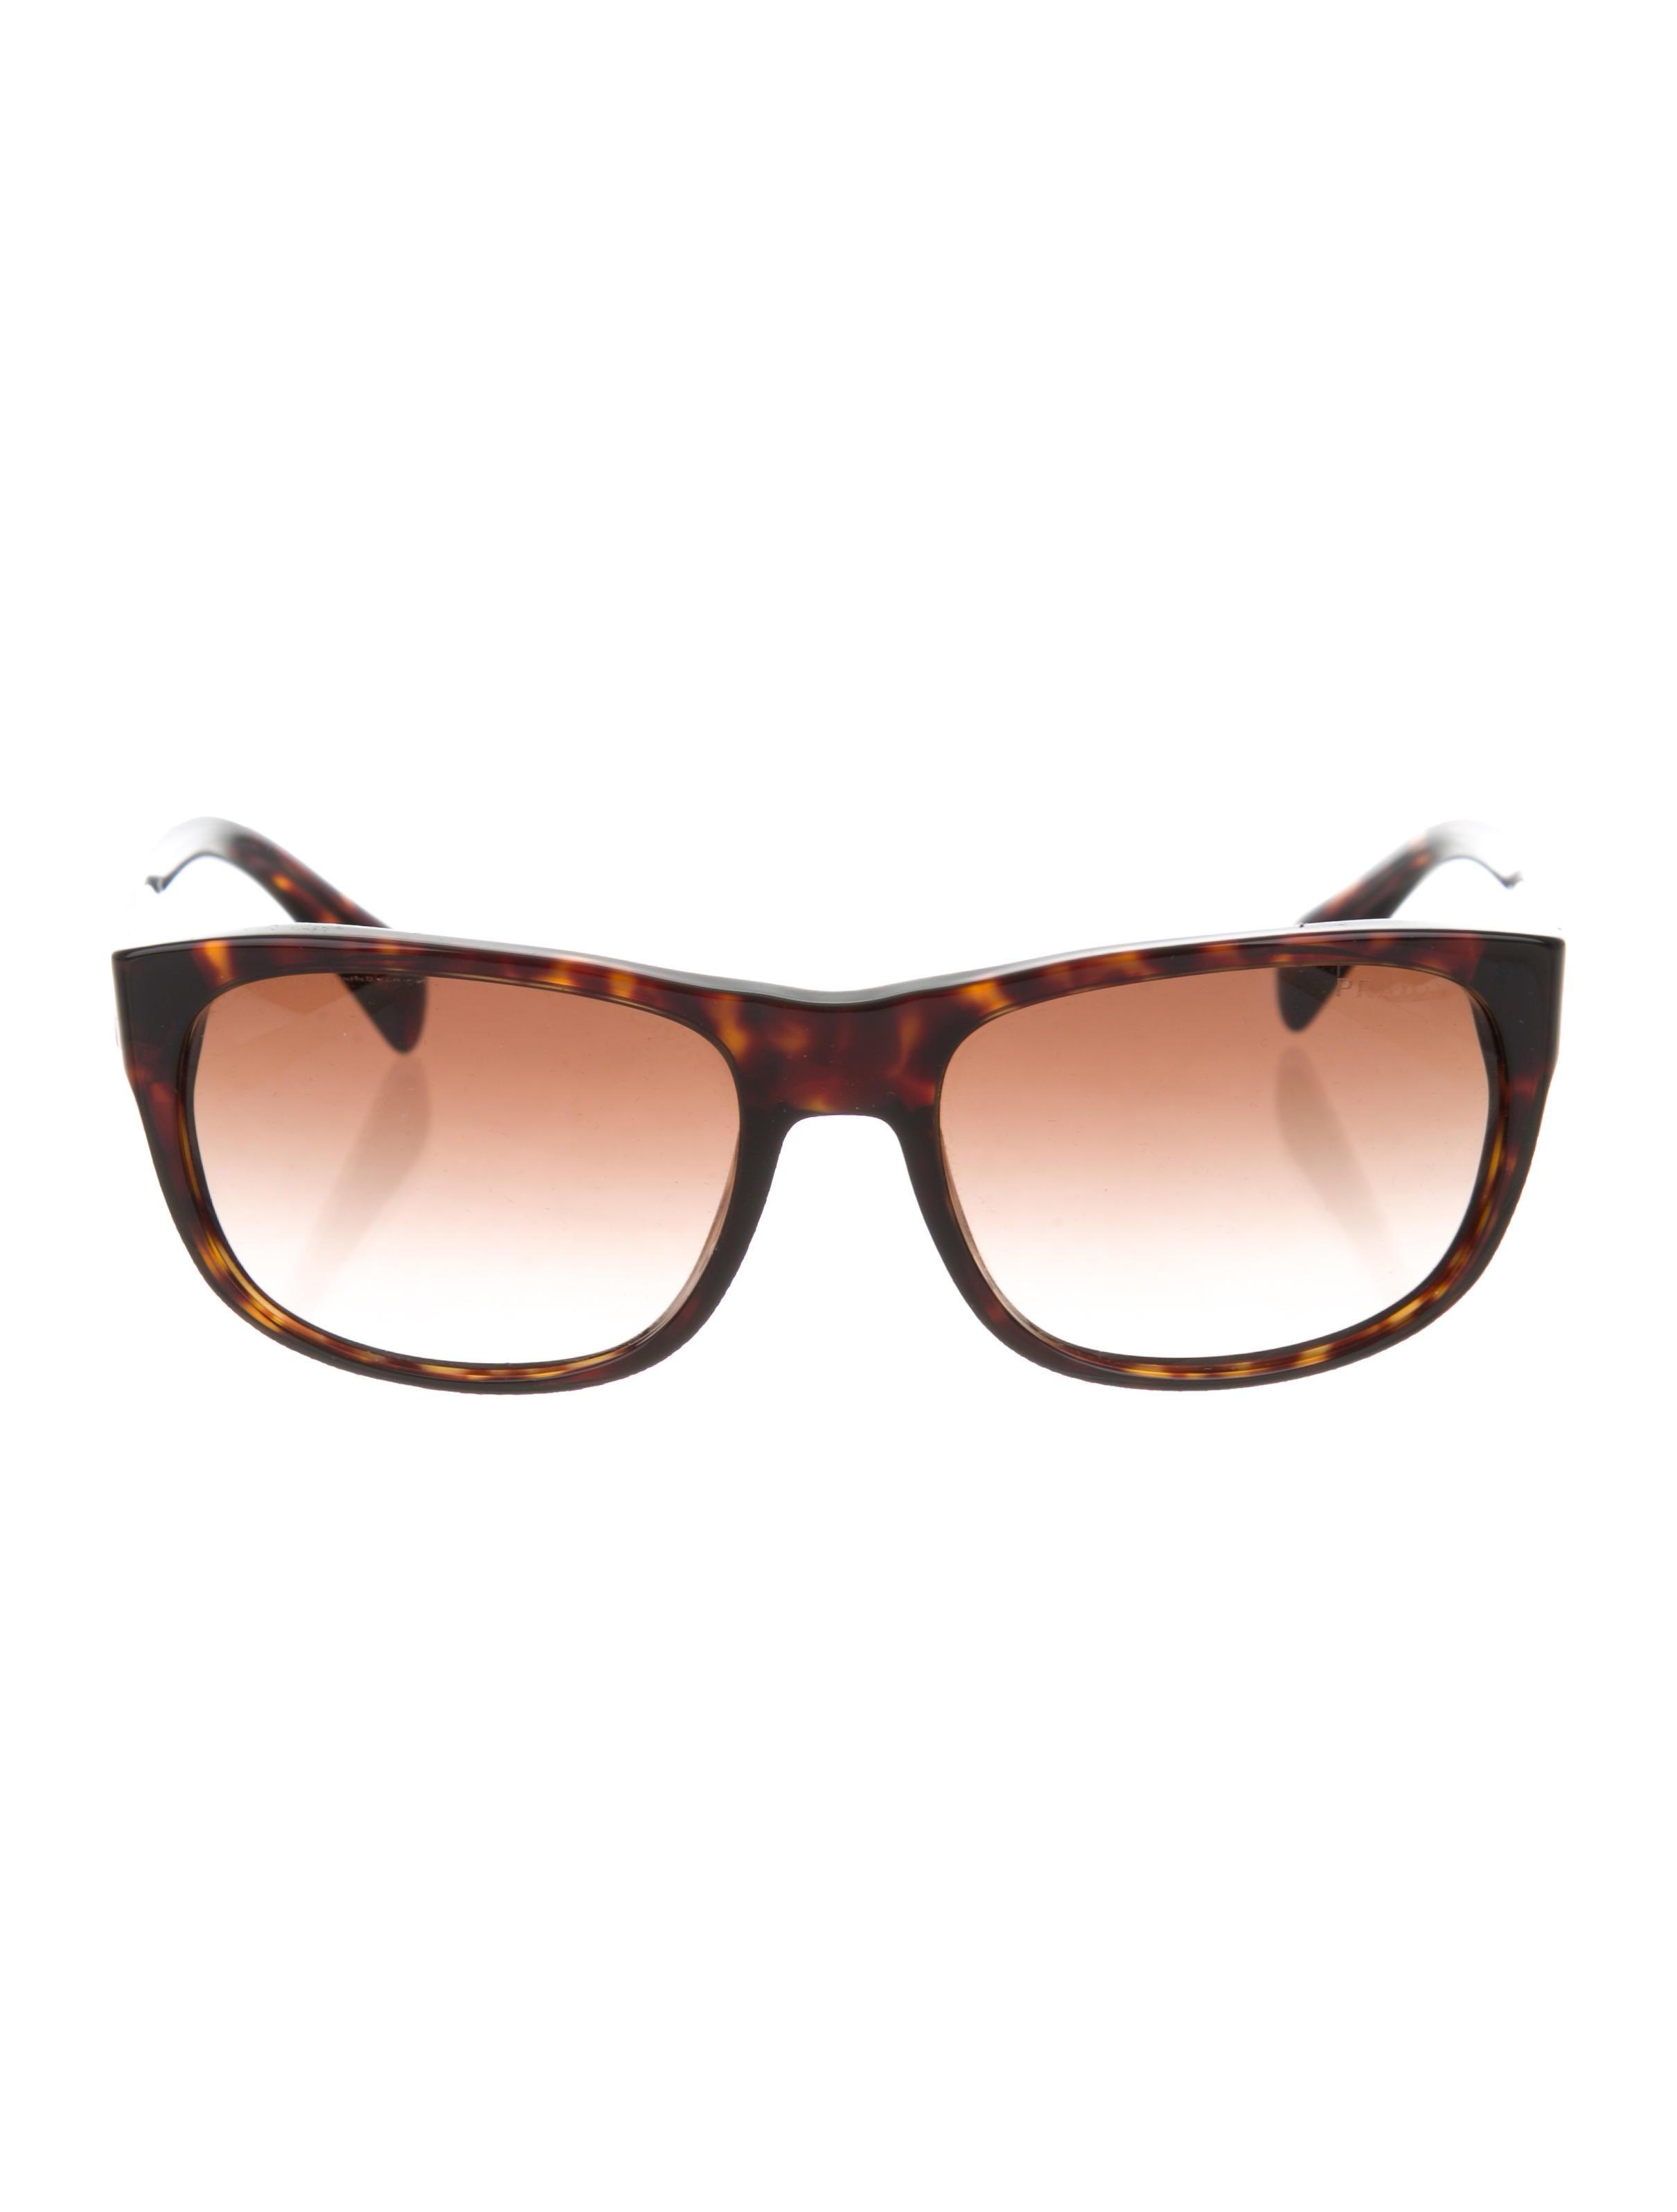 39a7ababa7aa Prada Tinted Lens Sunglasses - Accessories - PRA191496